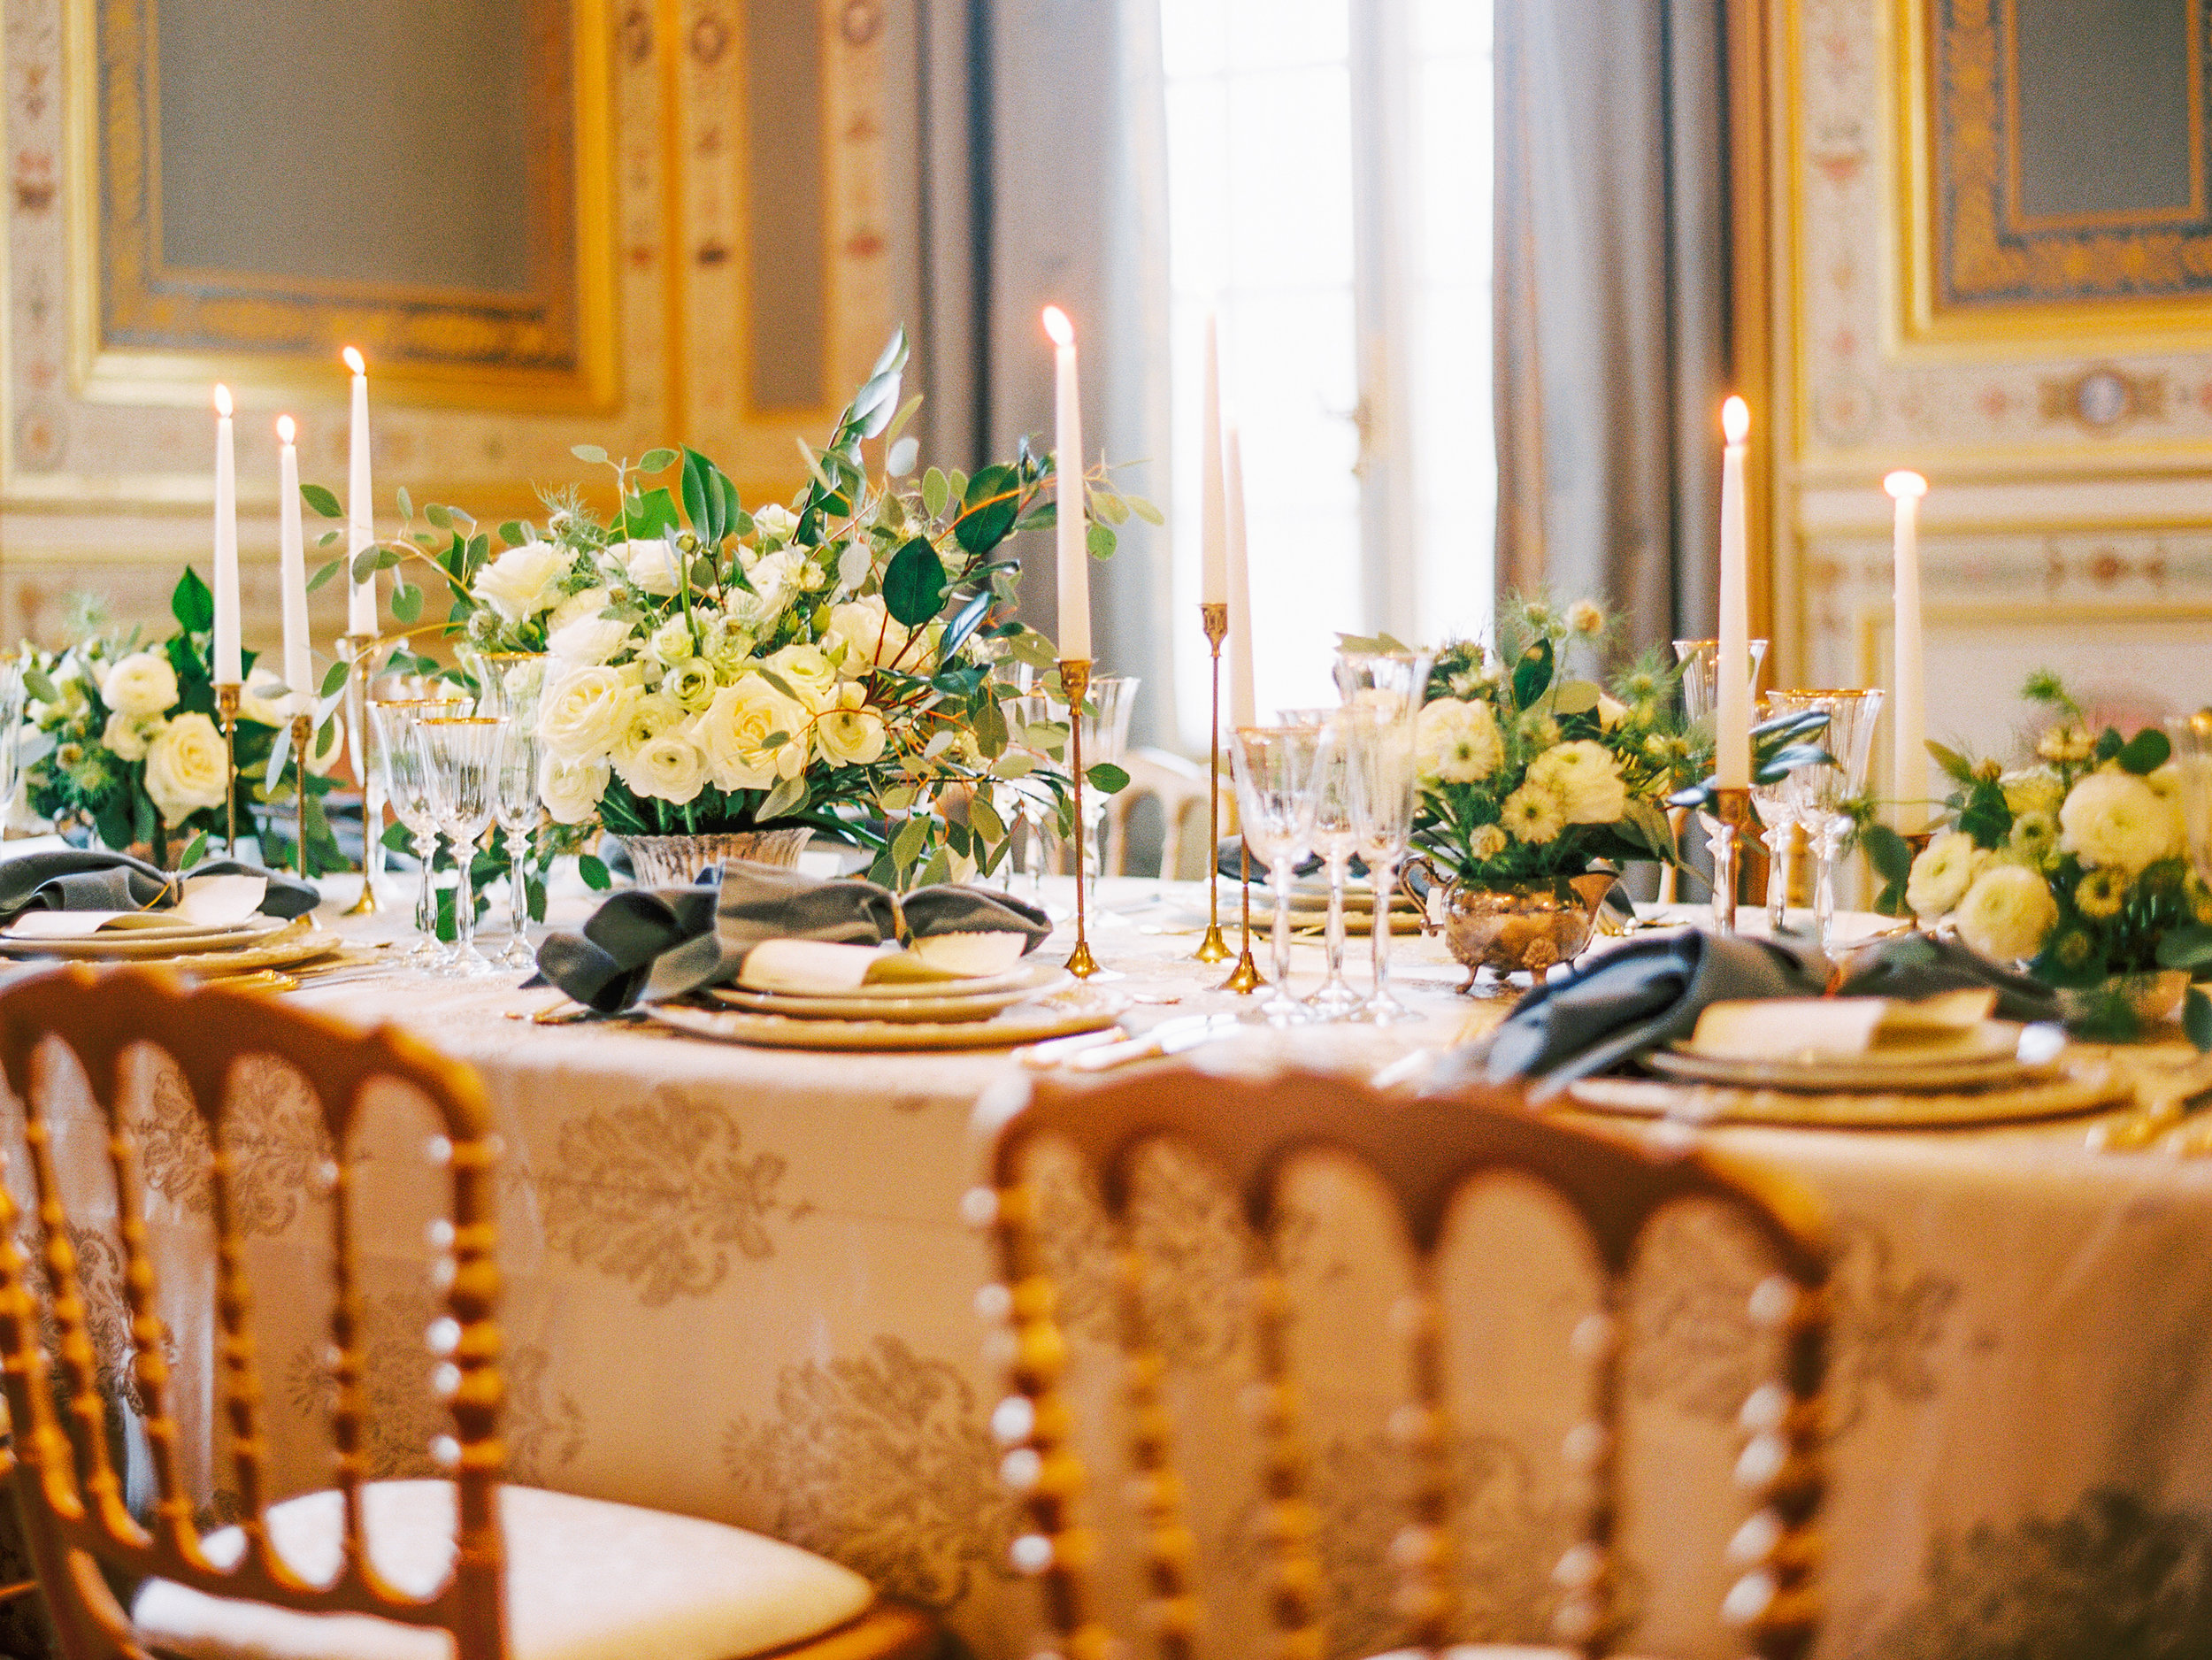 katie stoops photography-paris wedding-marchesa-cynthia martyn events13.jpg